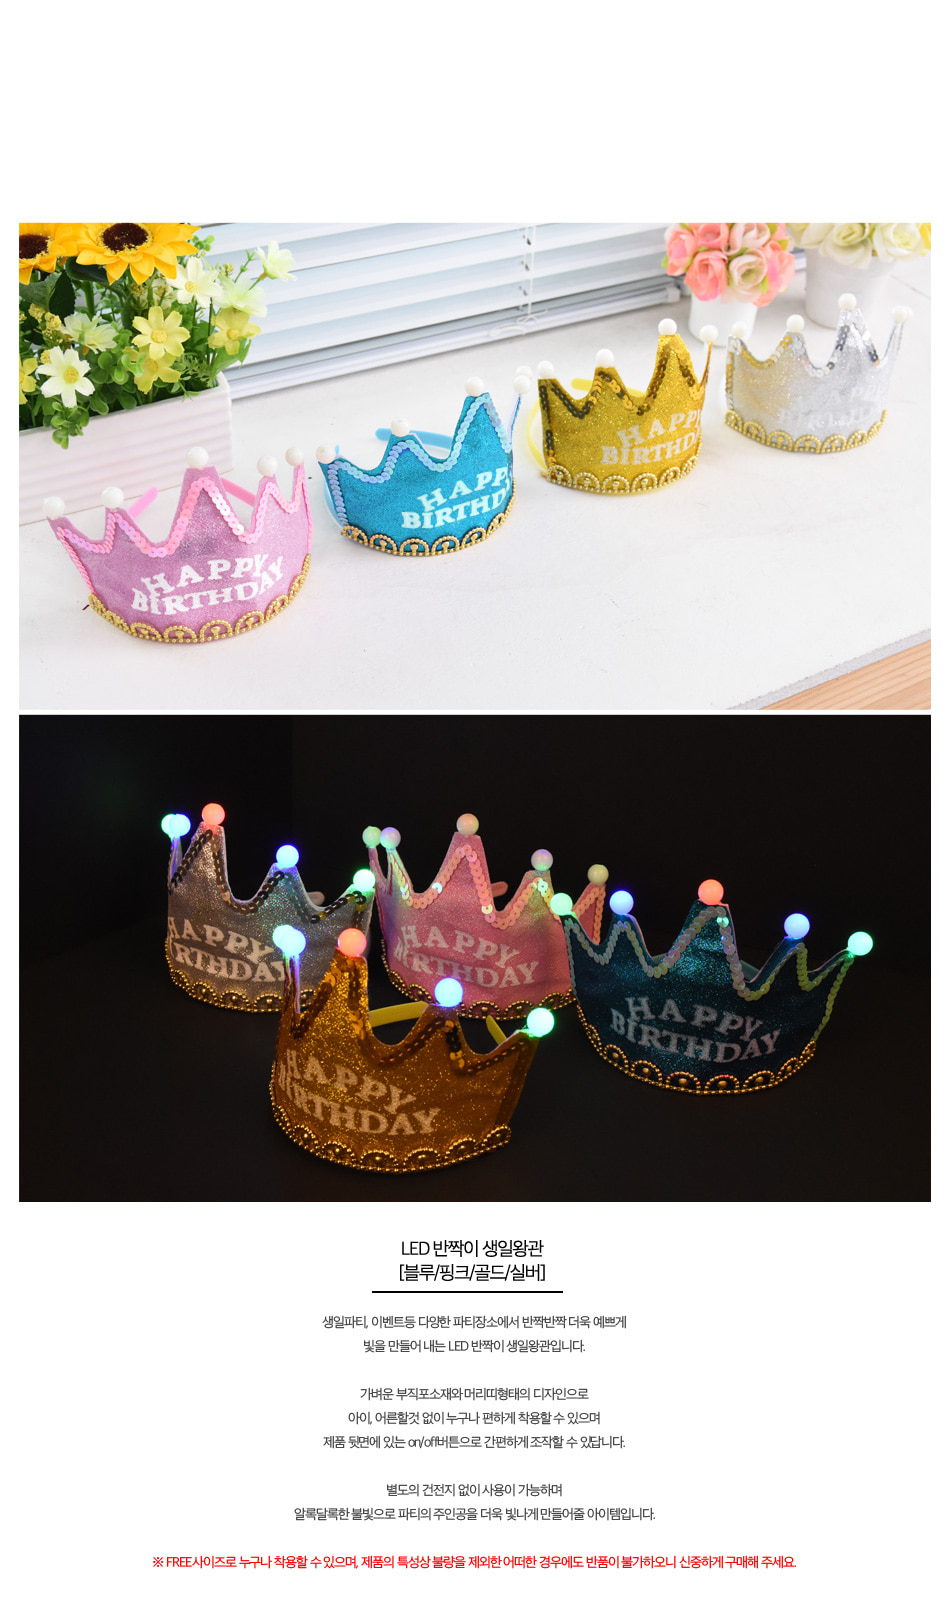 LED 반짝이 생일왕관 [골드] - 파티해, 3,500원, 파티의상/잡화, 머리띠/머리장식/가발